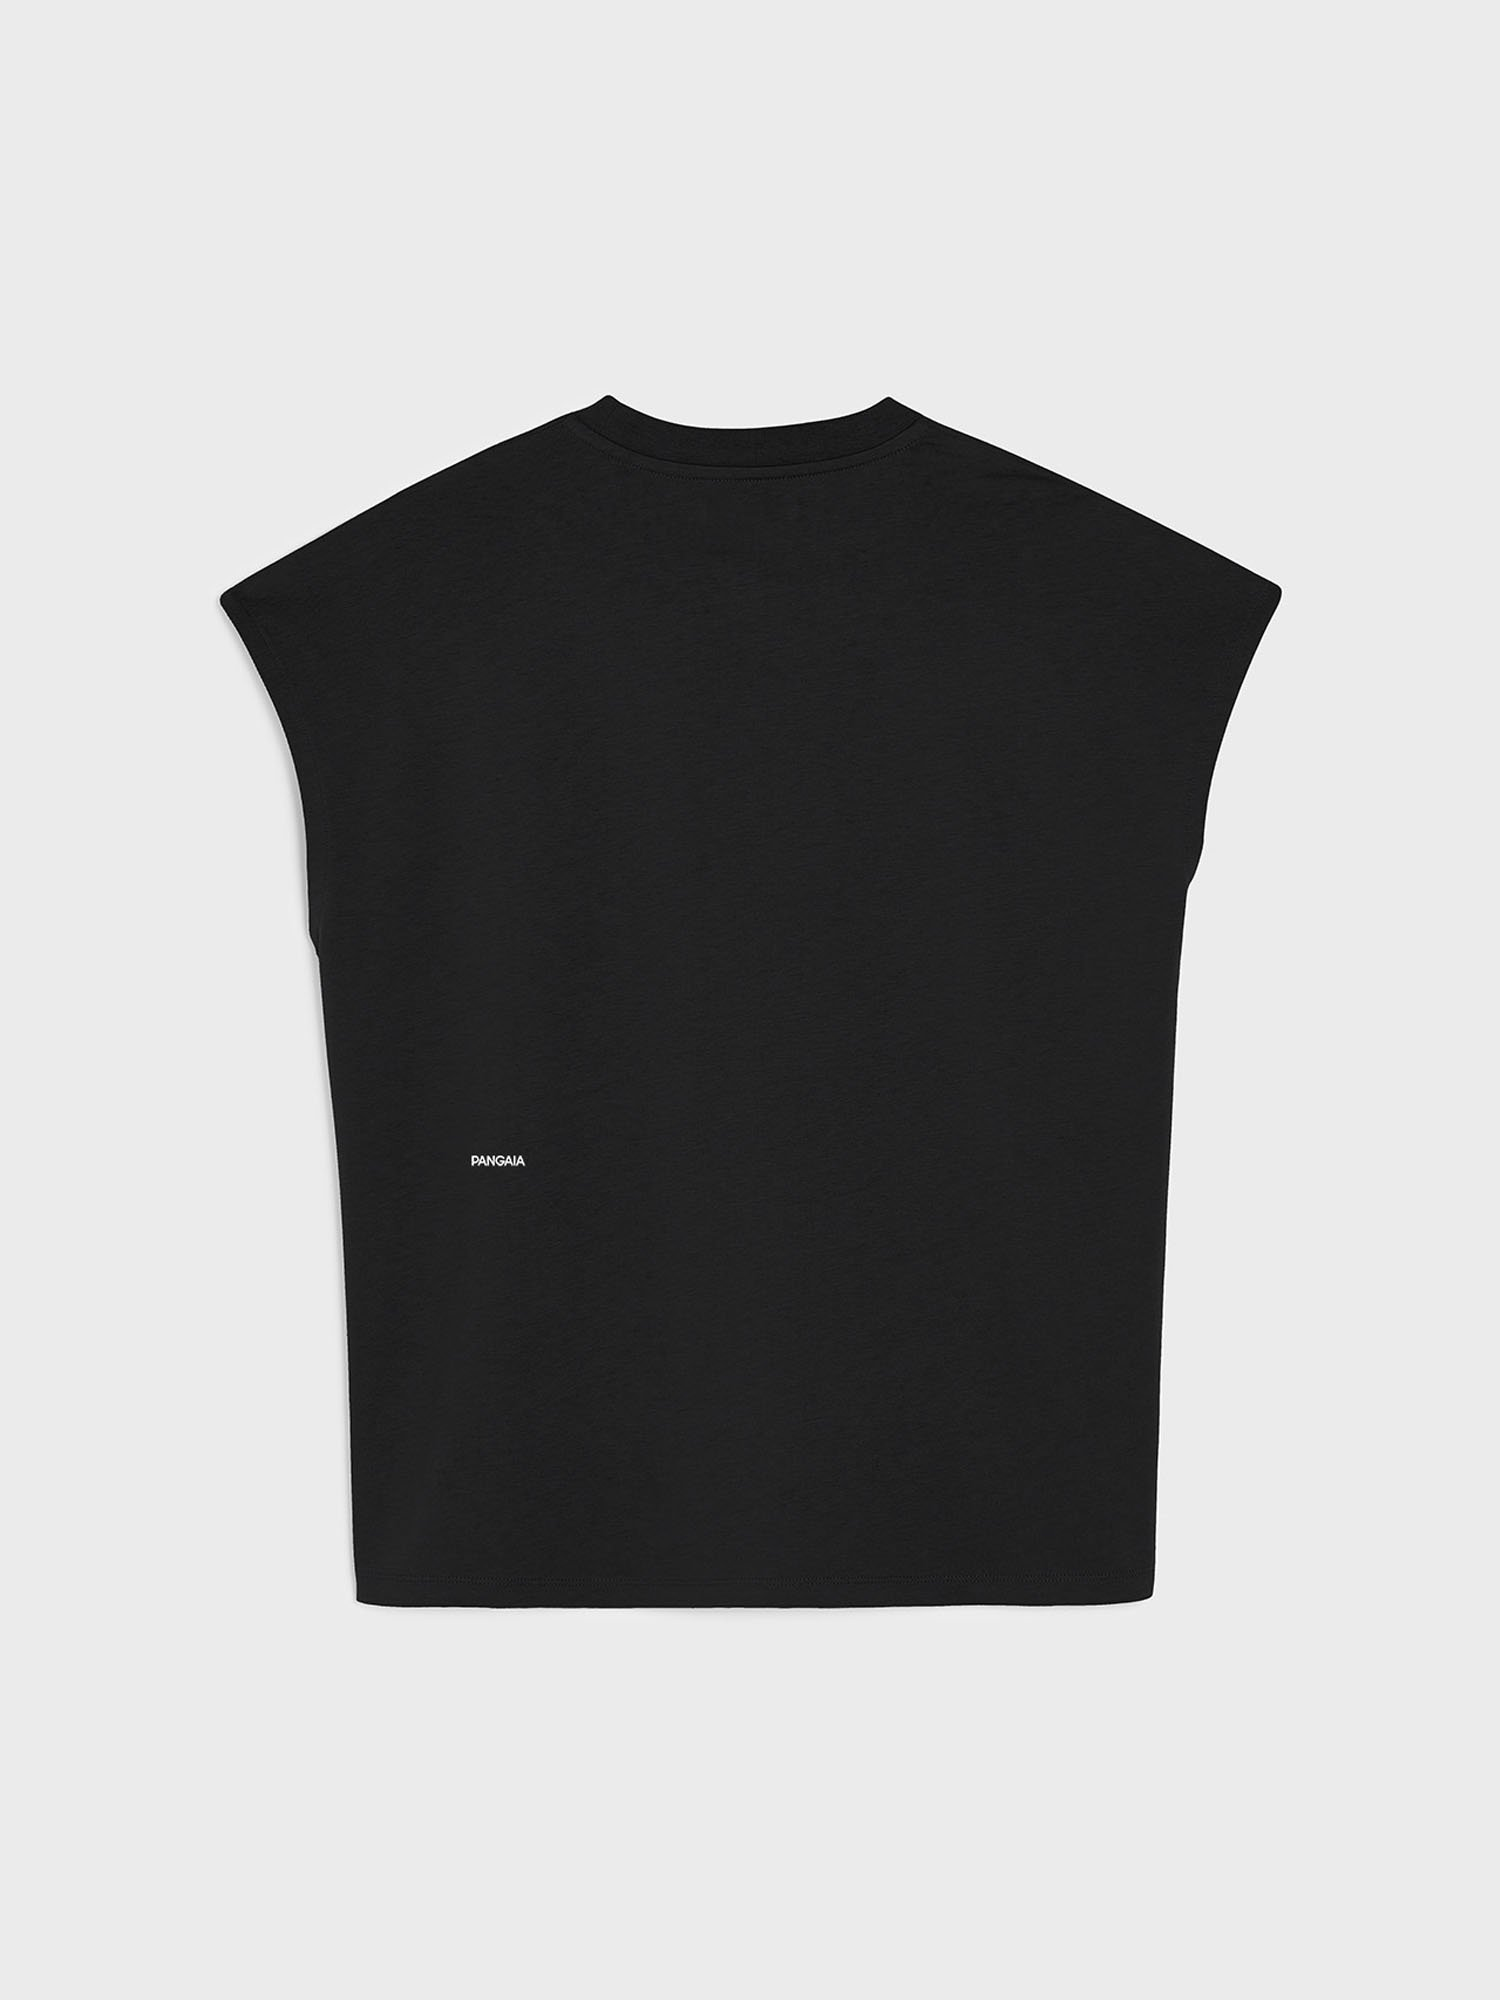 Pangaia Organic Cotton Cropped Shoulder T-shirt with C-FIBER™